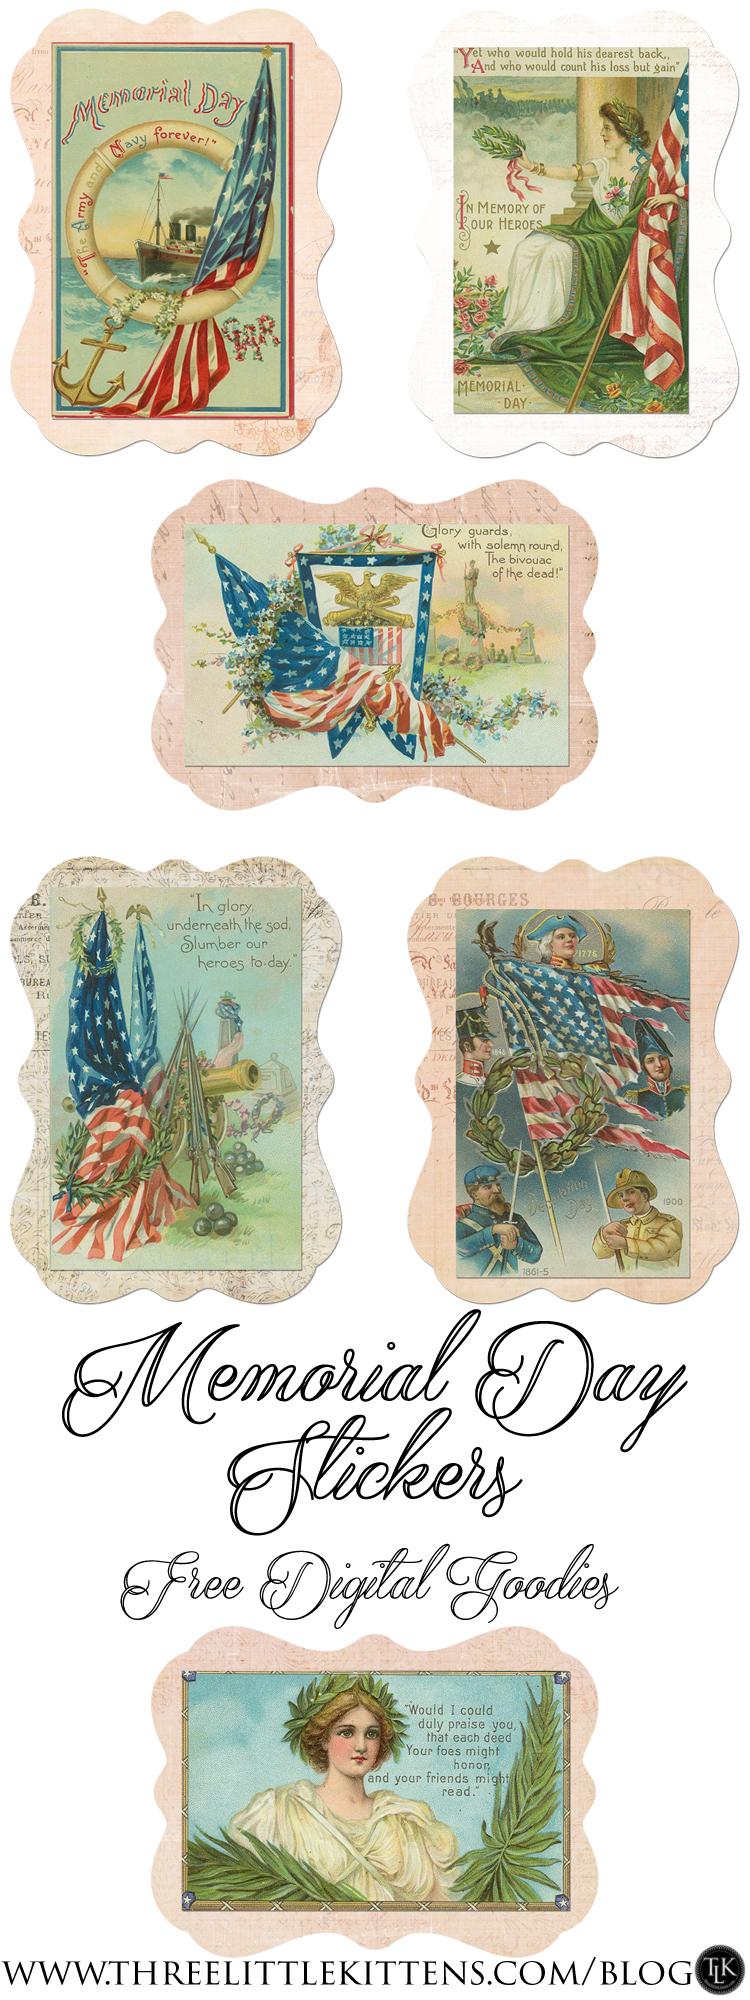 Memorial Day Stickers - DGD - Digtial Goodie Day - Free Printables on threelittlekittens.com/blog